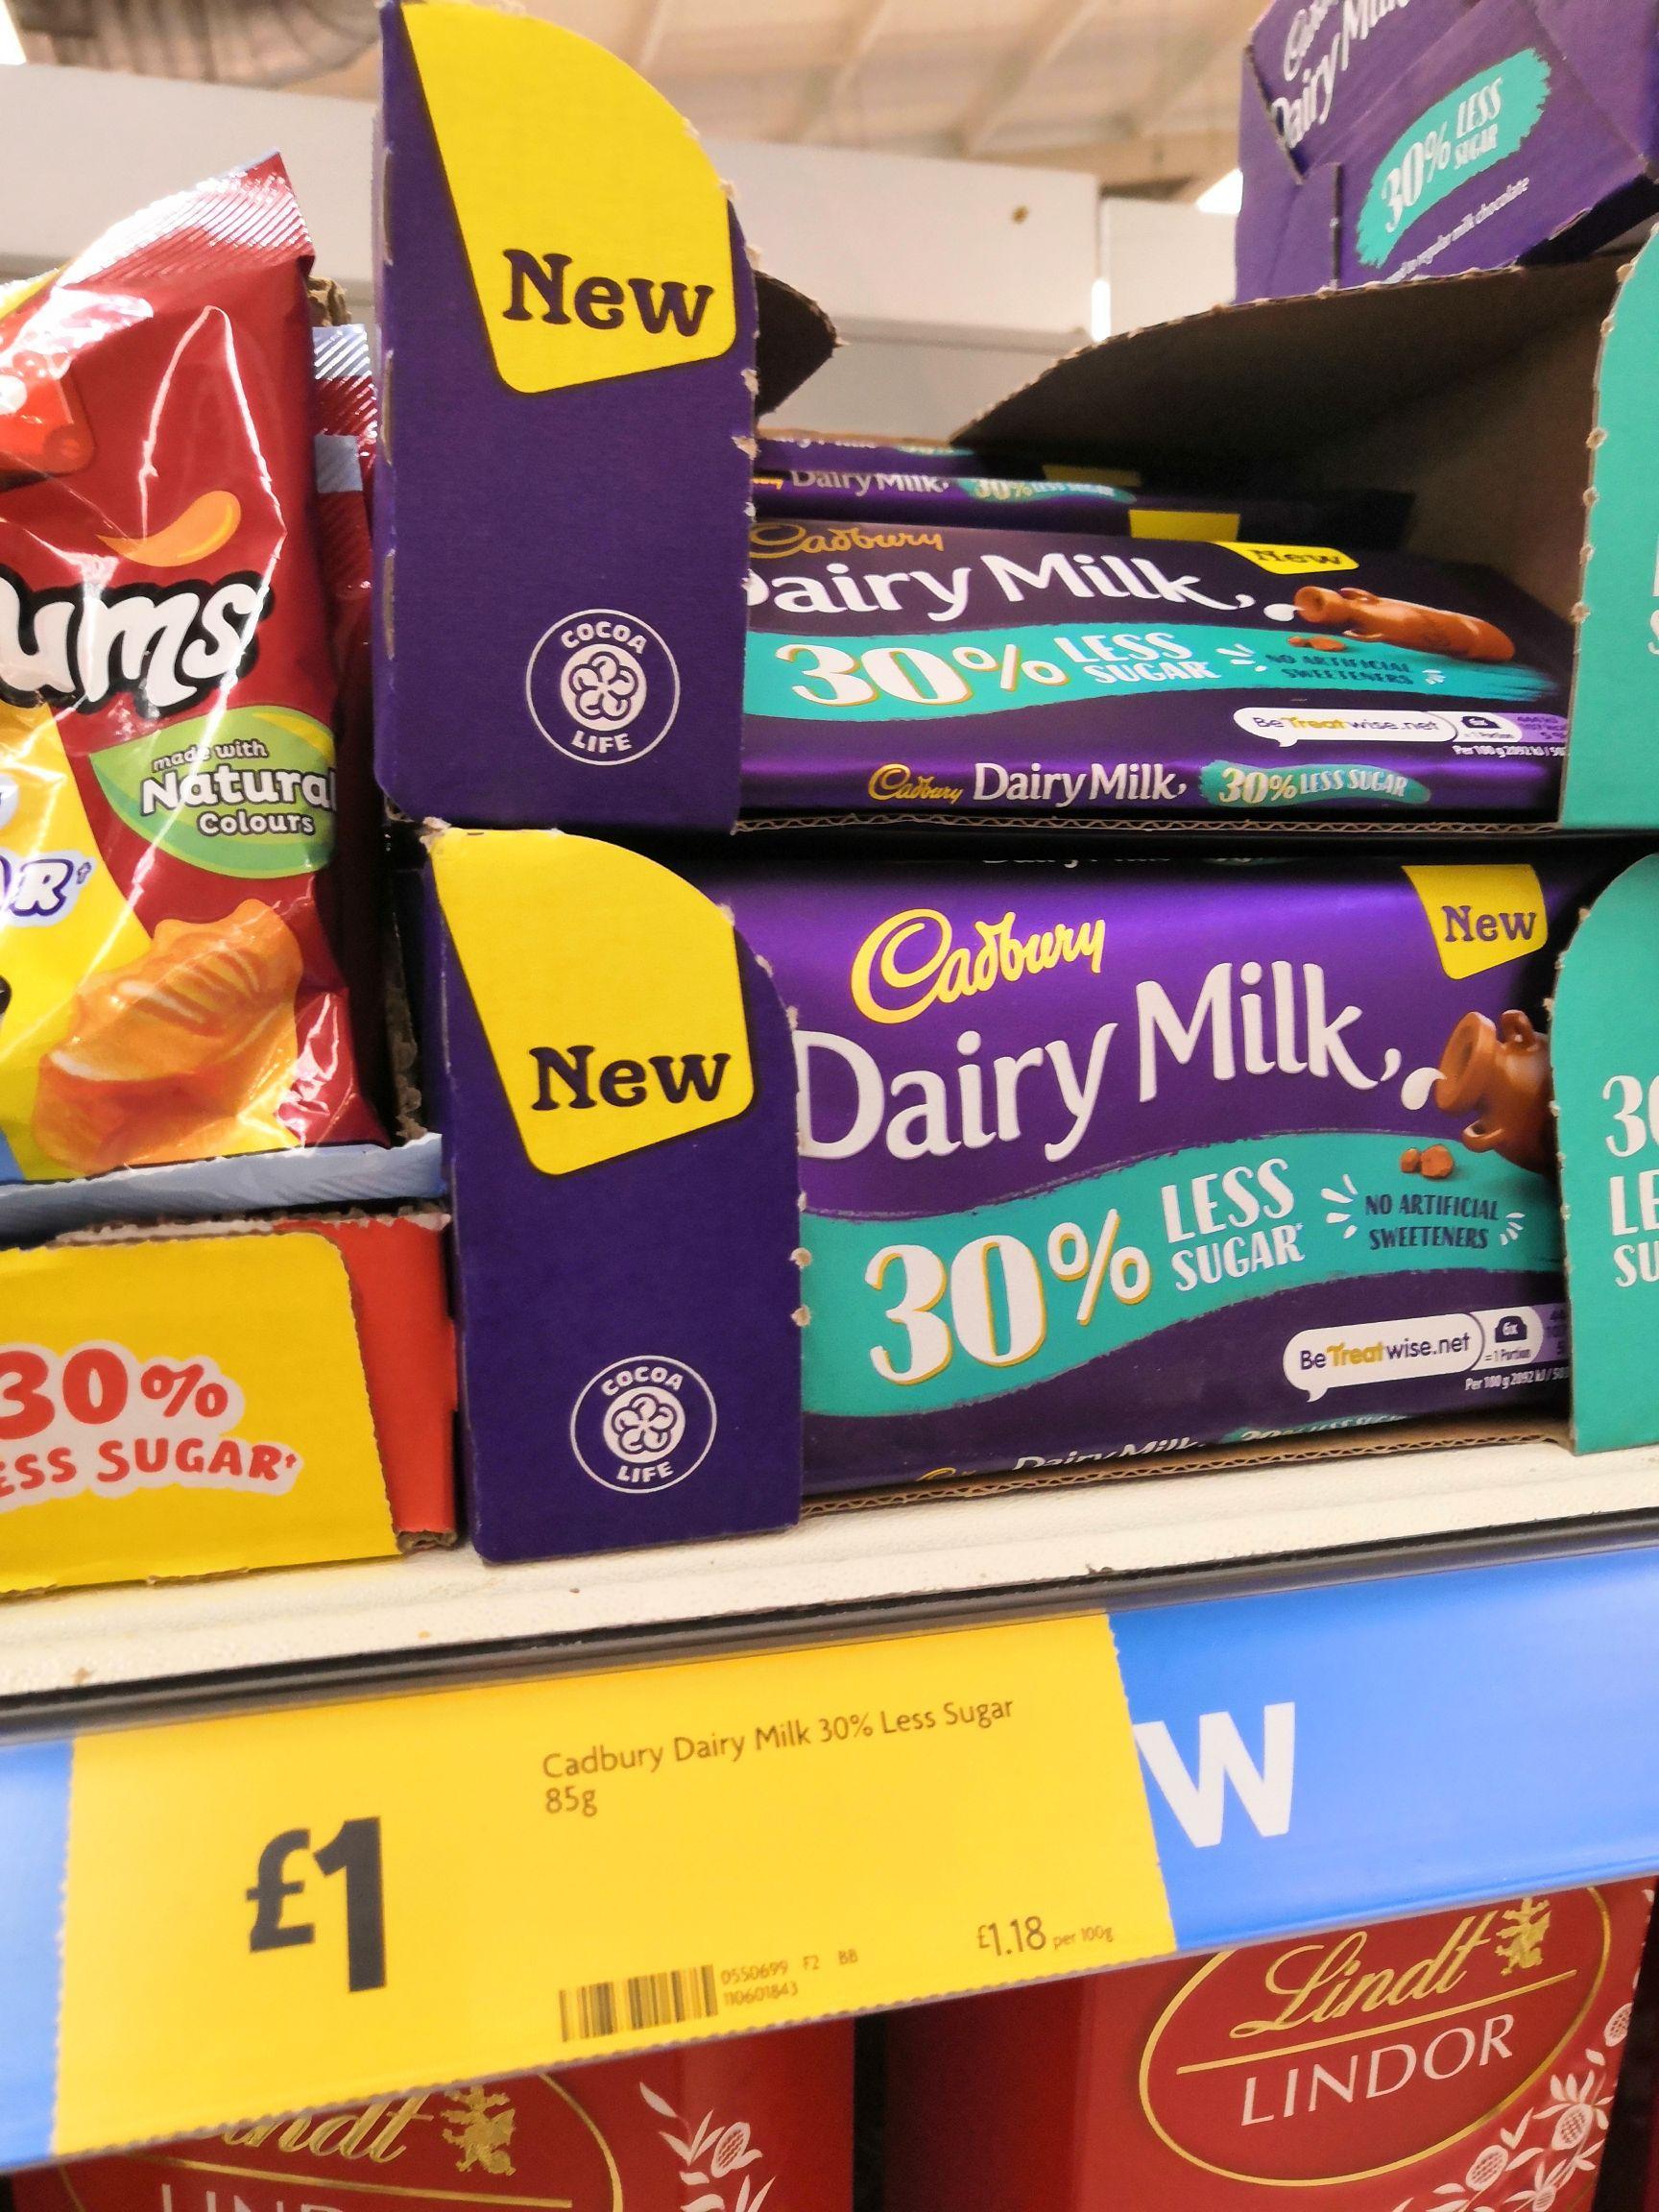 Cadbury Dairy Milk 30% Less Sugar 85g £1 @ Morrisons instore